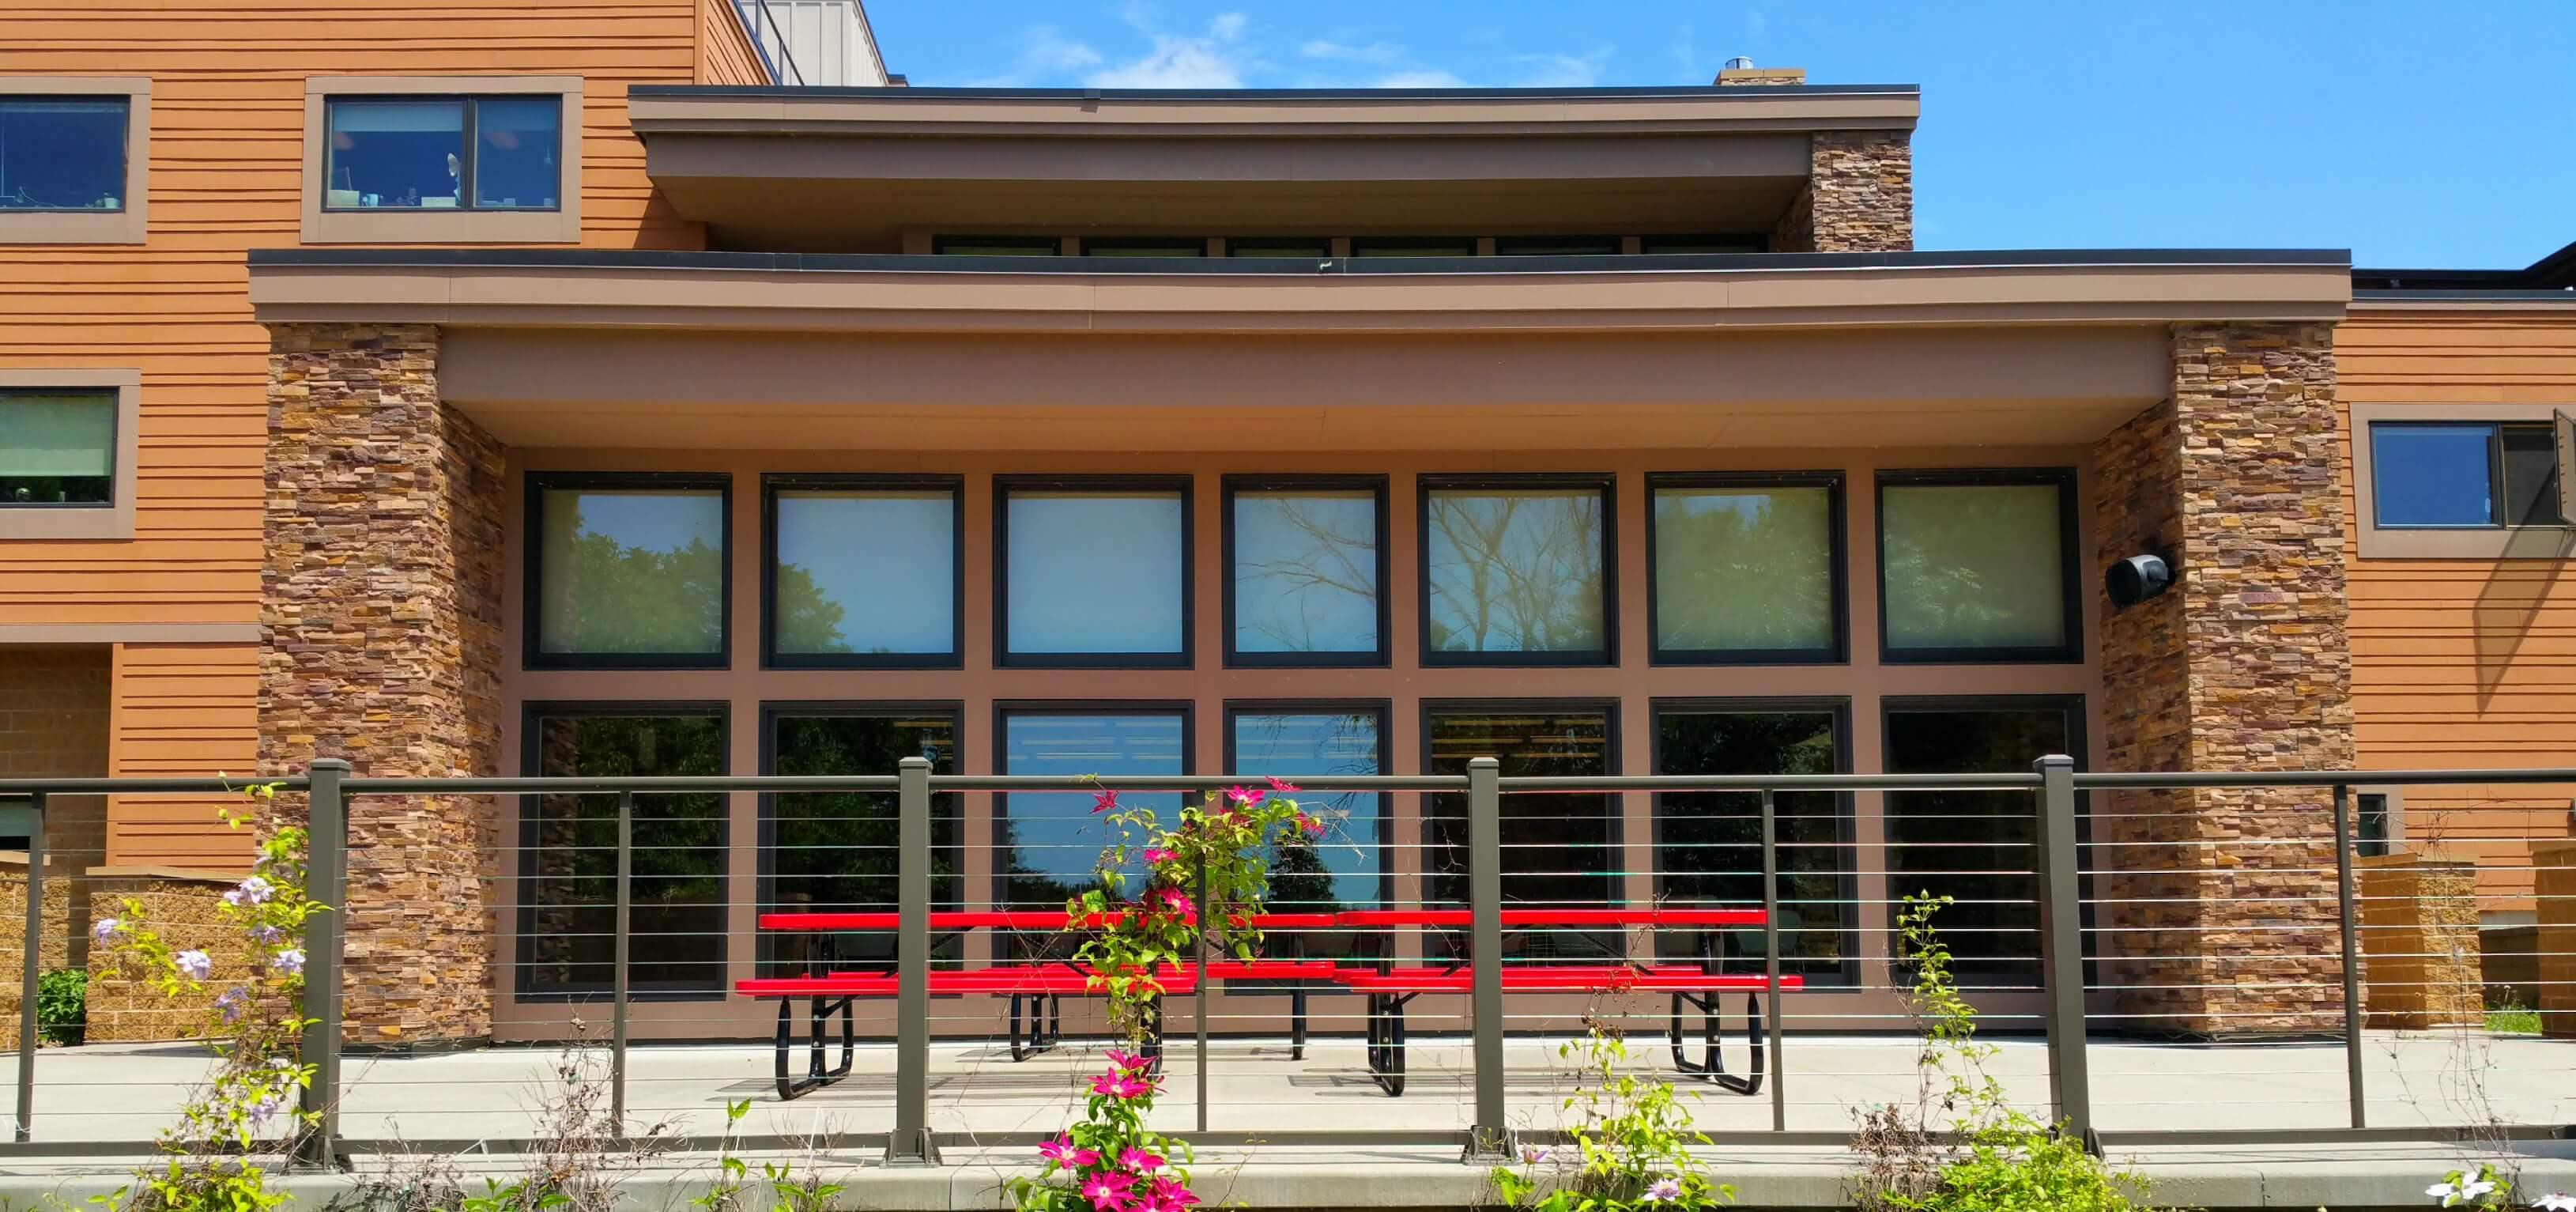 Vinland National Rehabilitation Center, Loretto, Minnesota